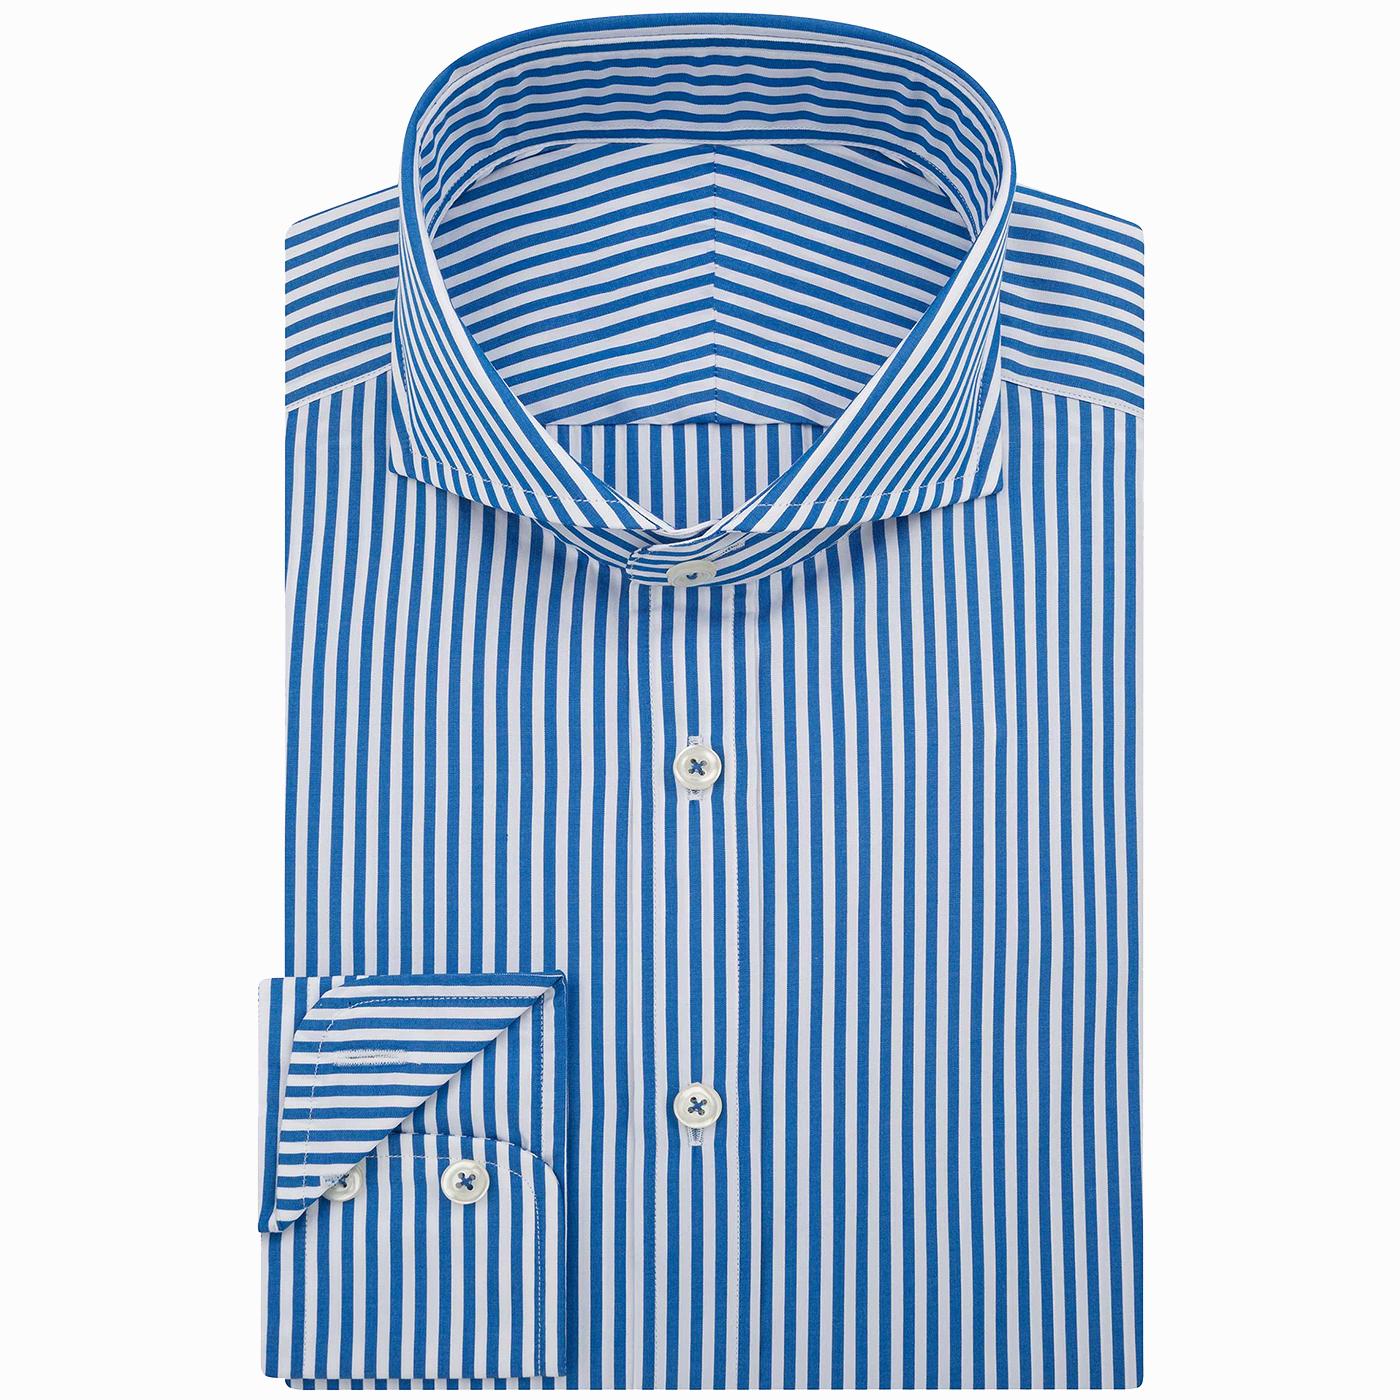 Shirt_2_Bengal-stripe_blue.jpg